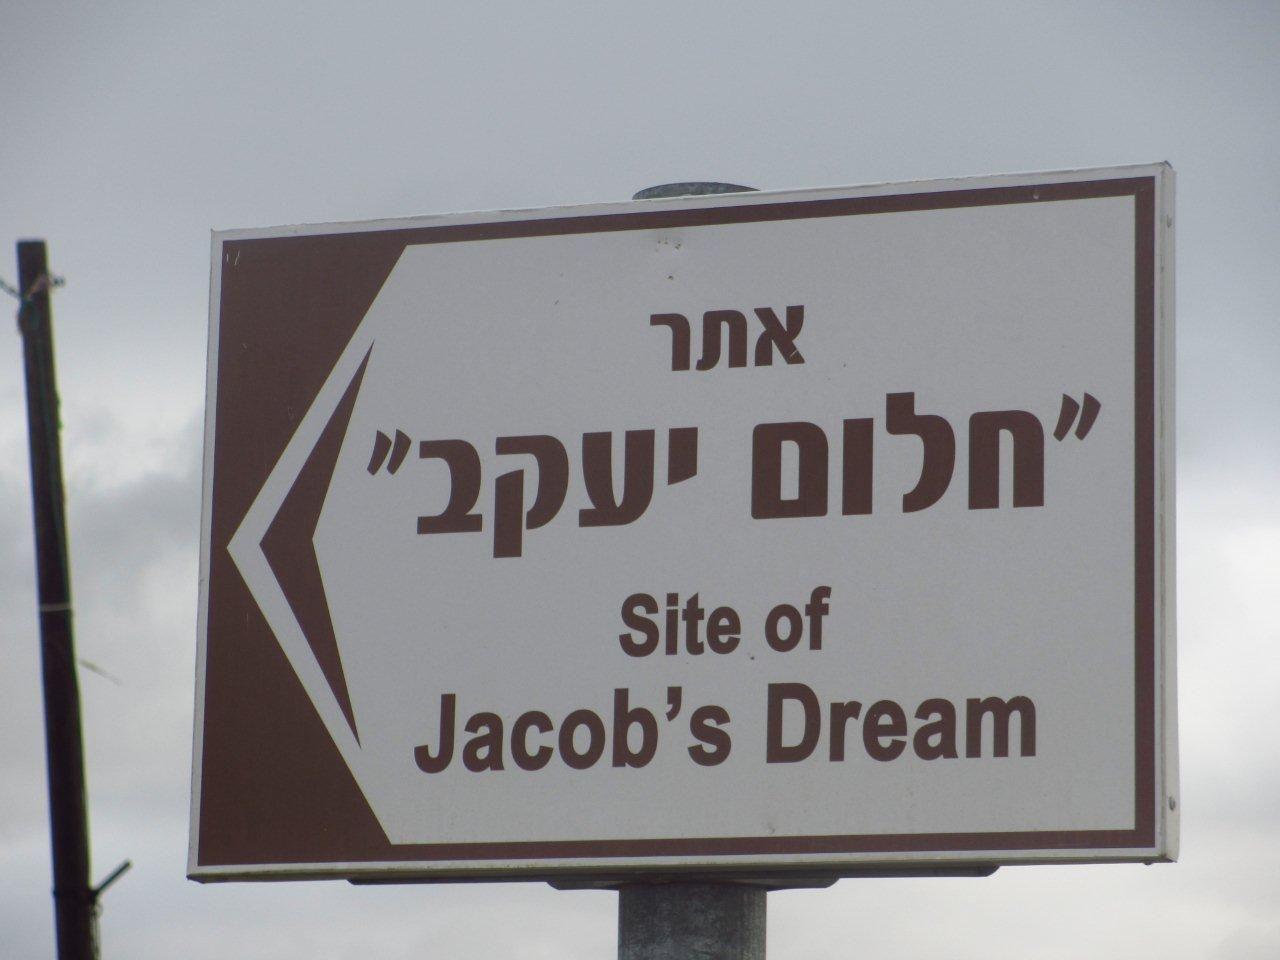 Bethel Israel: Dream Vacations, Life, Bethel